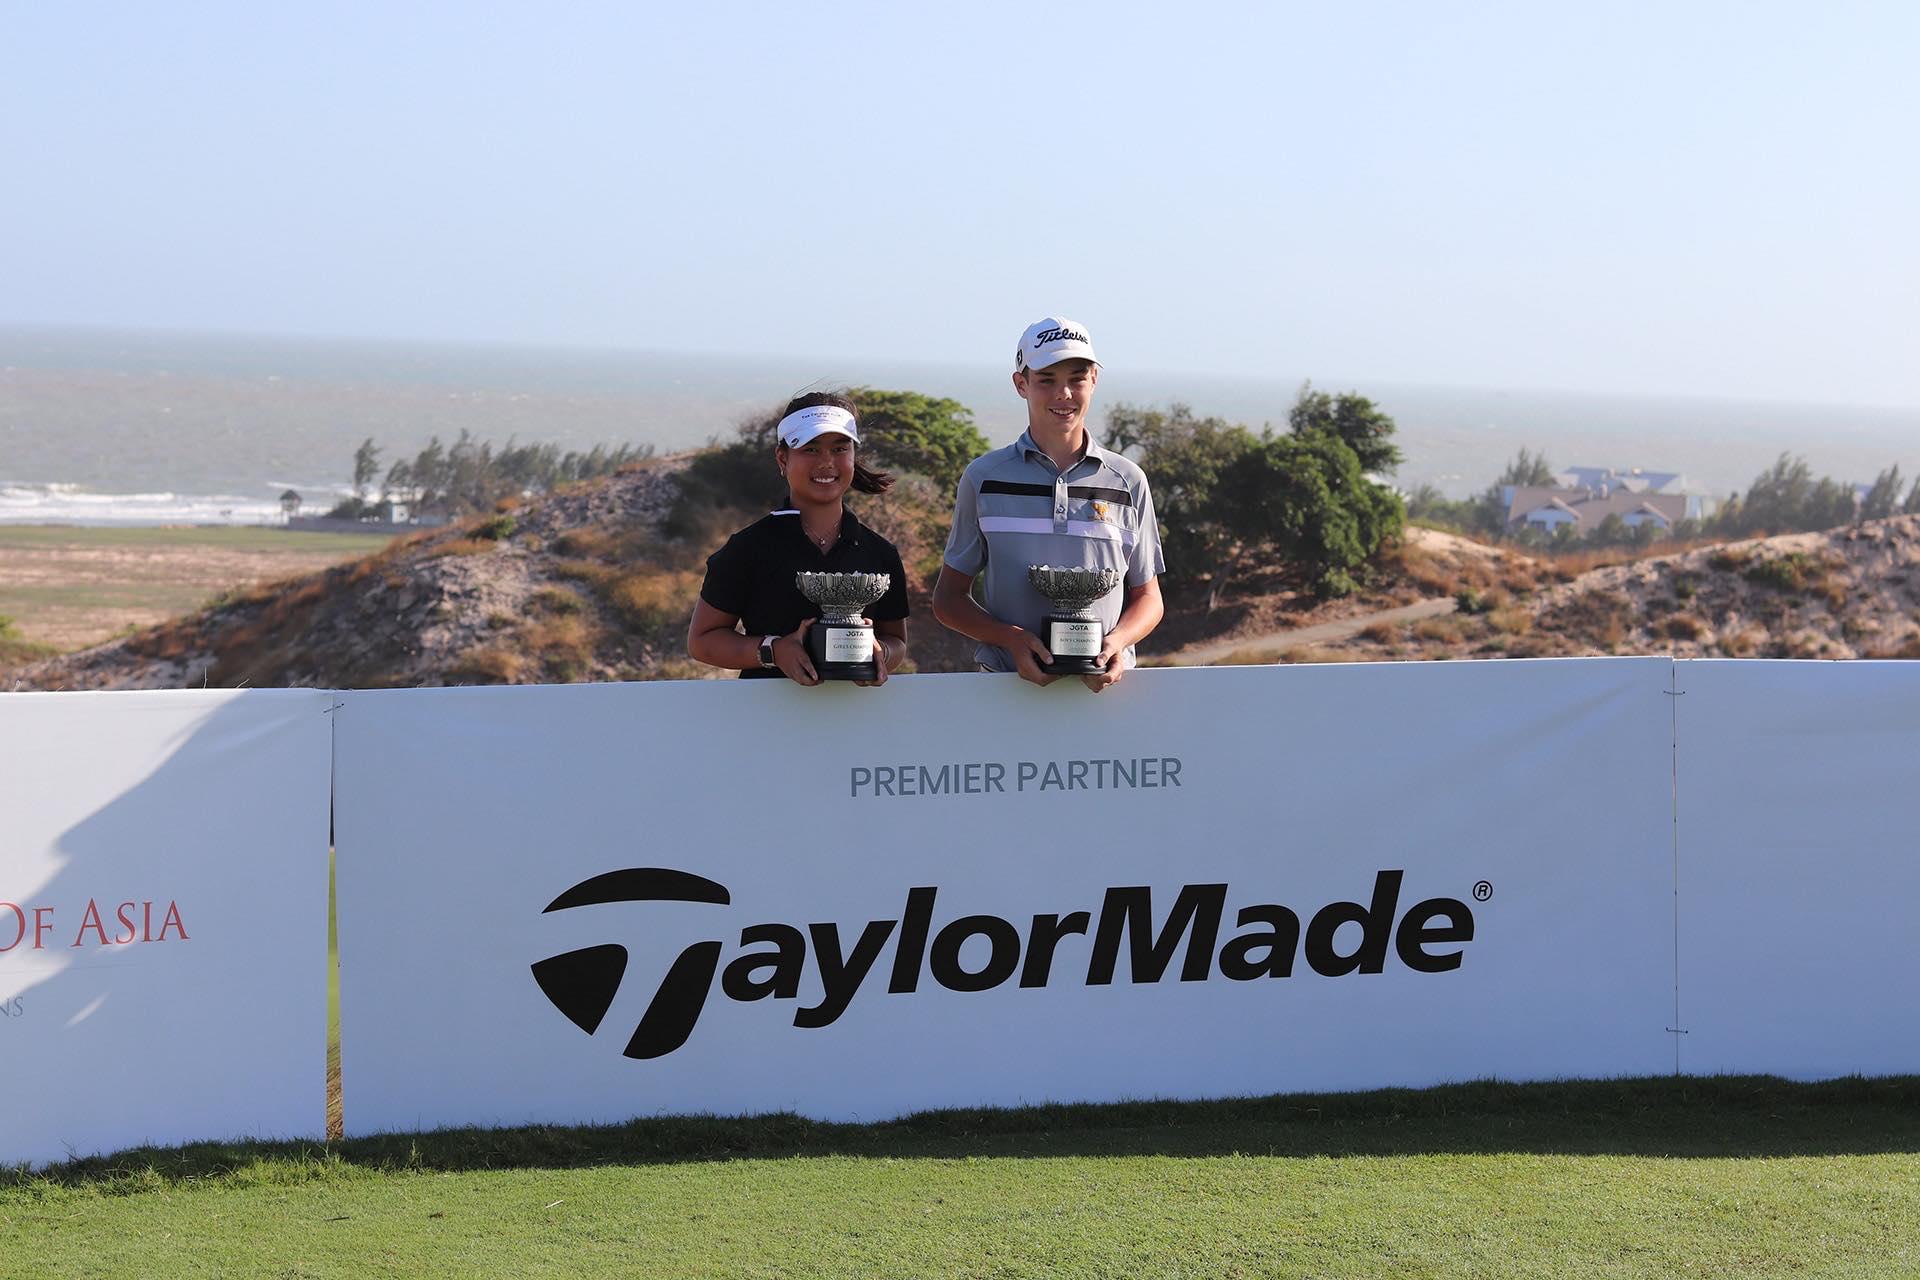 Junior Aspirations at The Bluffs Champions posing behind TaylorMade Signage, Premier Partner of the JGTA